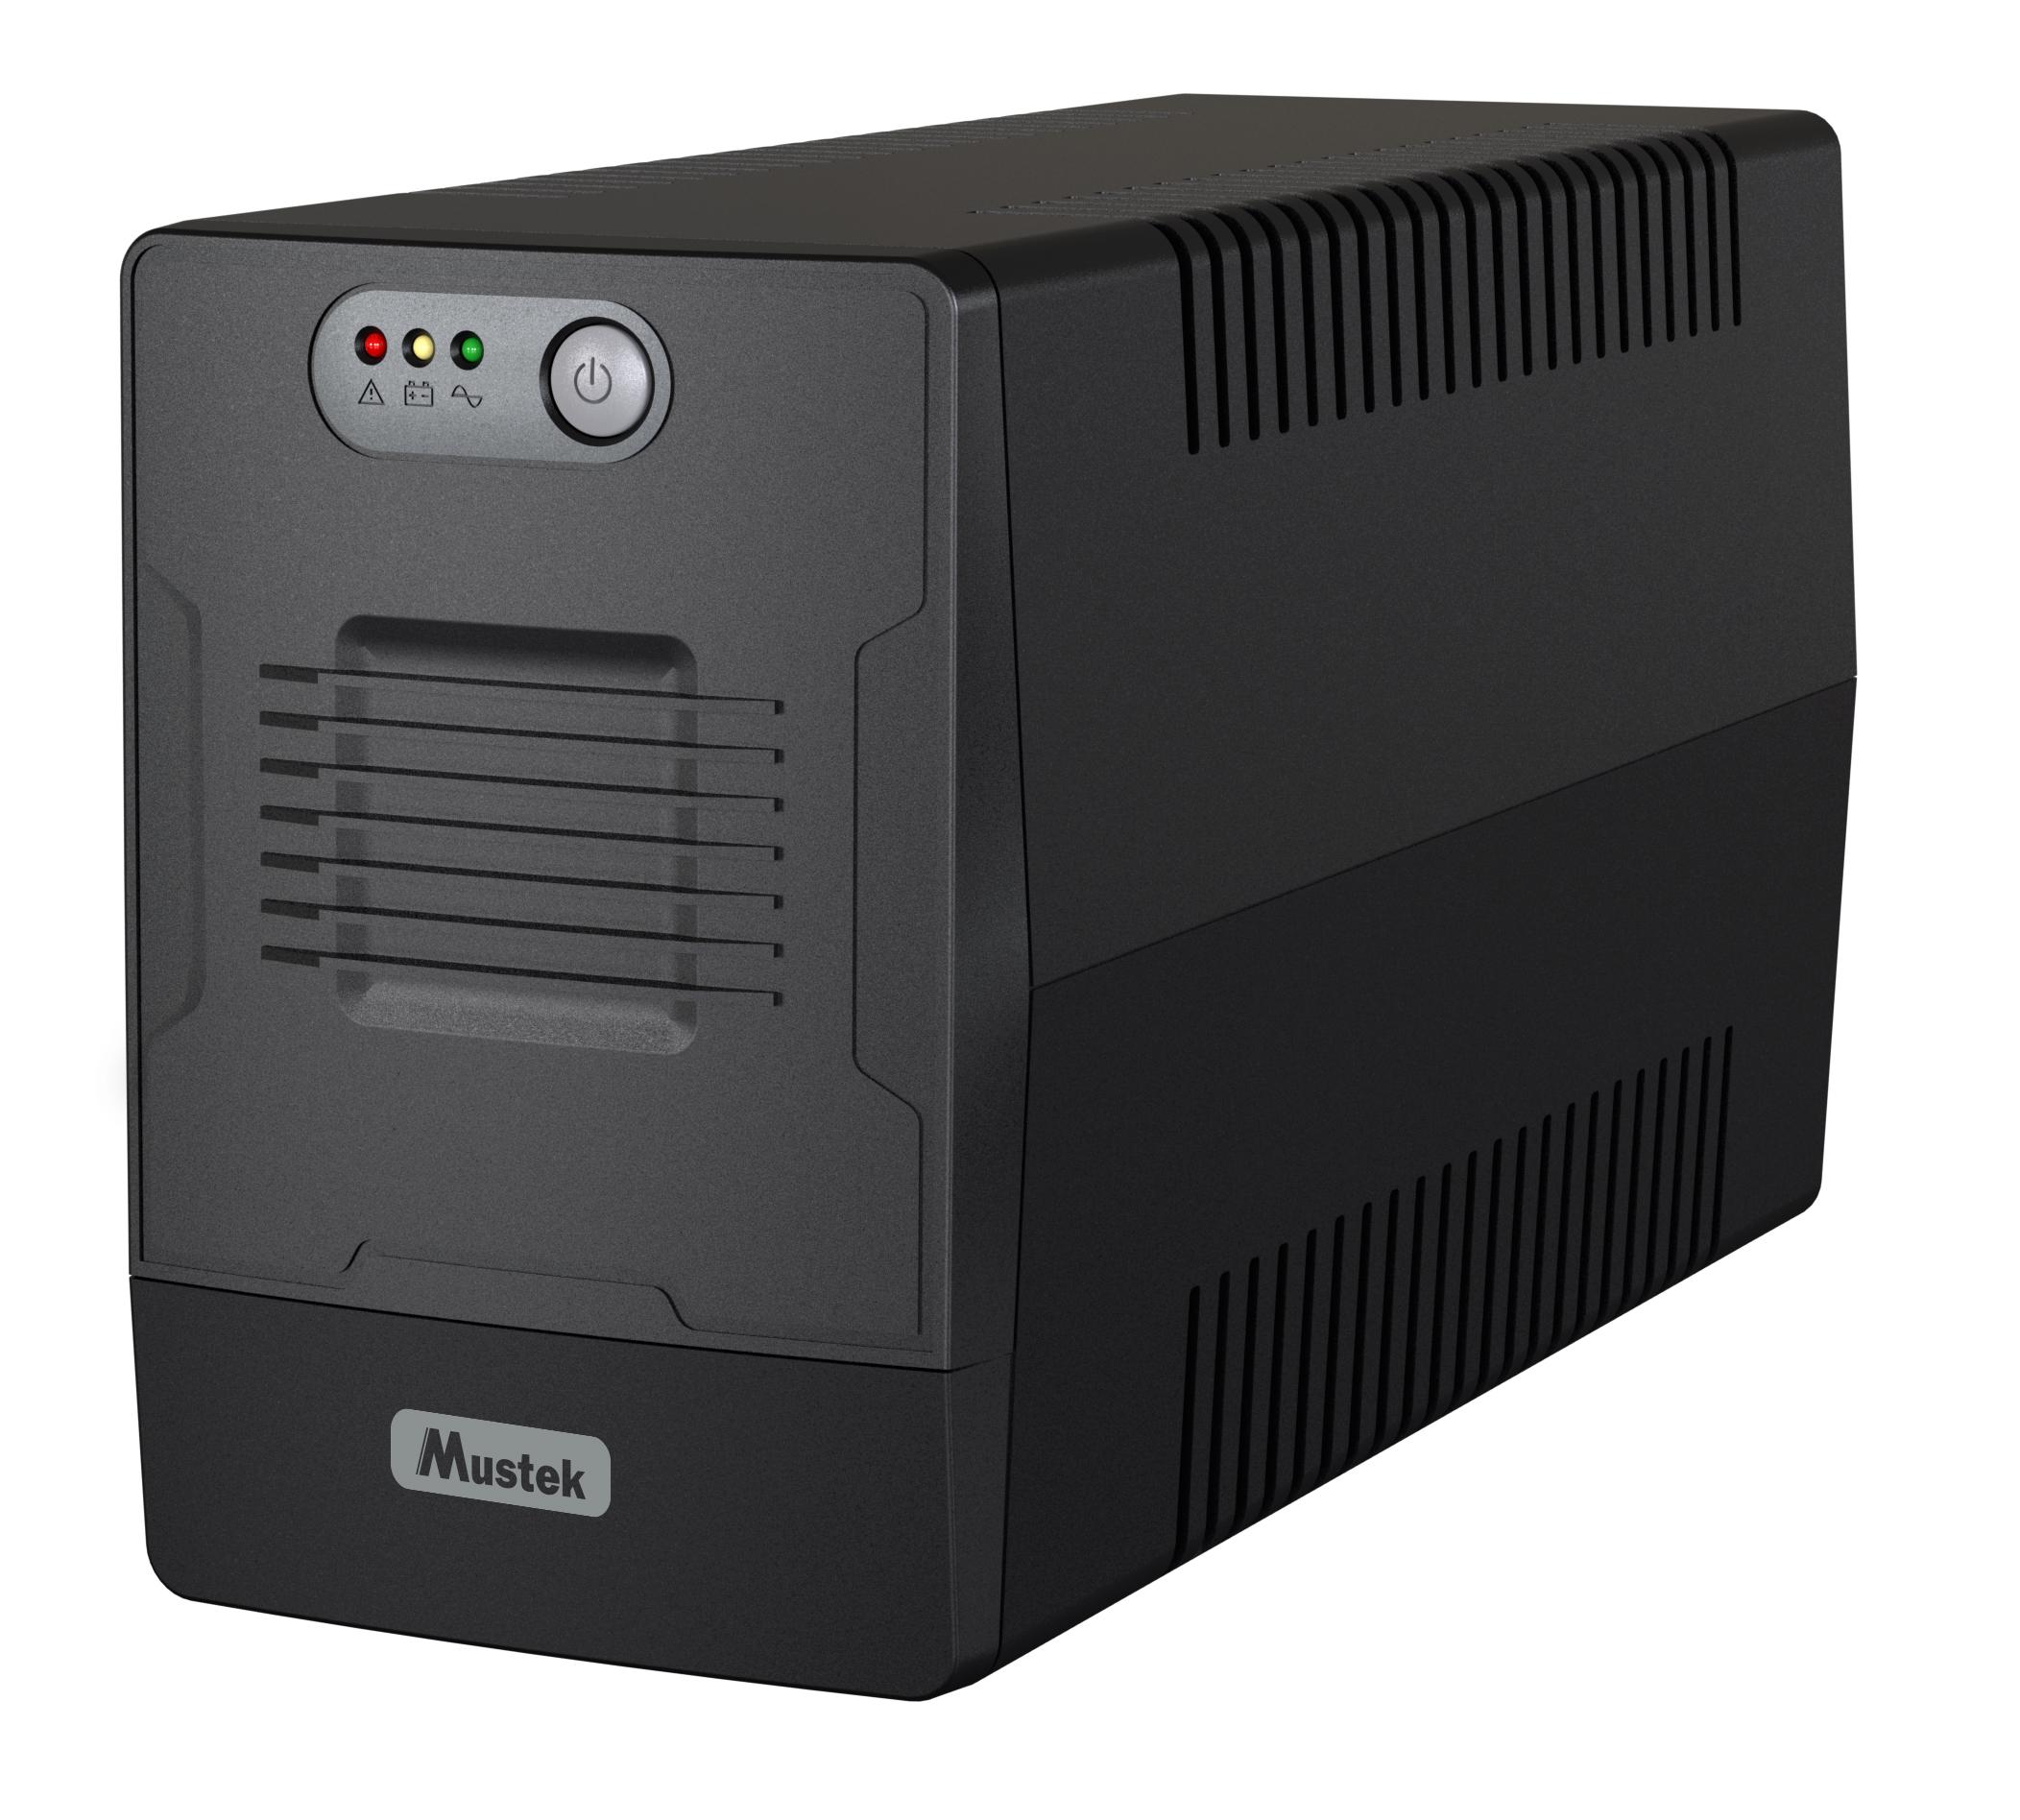 UPS Mustek PowerMust 1000 EG Line Interactive 1000VA/600W 4x Schuko